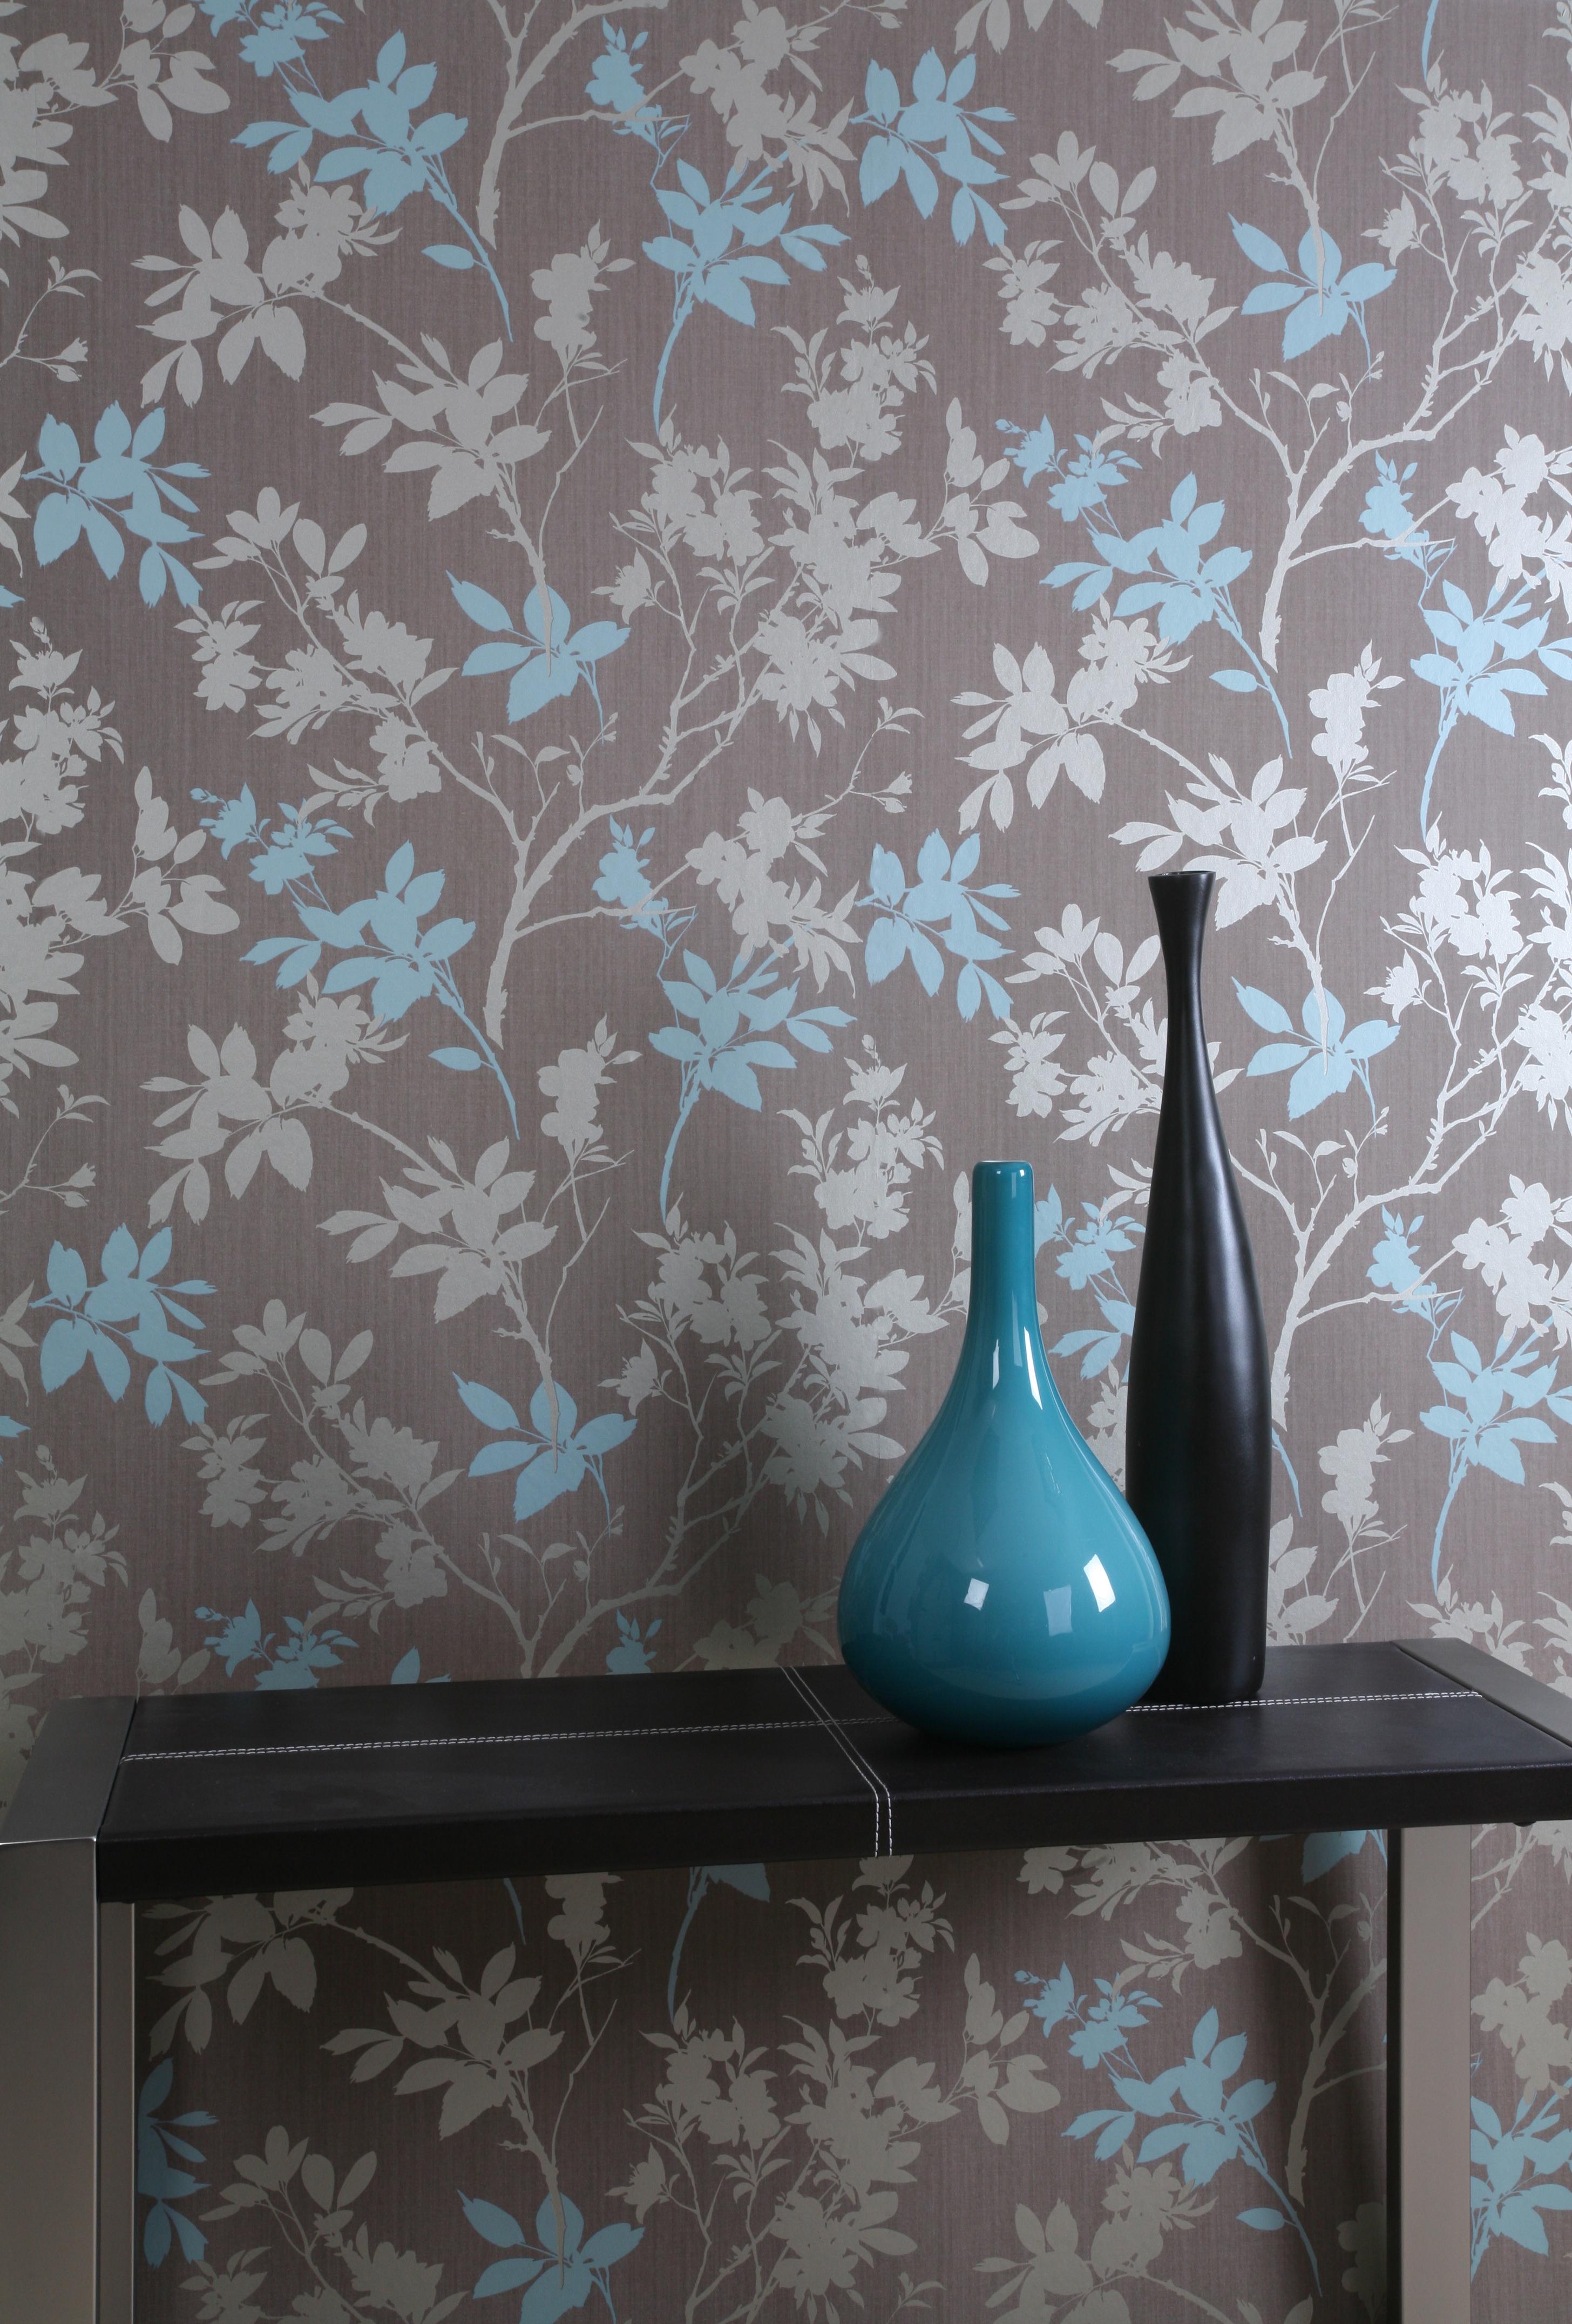 Art-House-Eco-Divine-Motif-wallpaper-wp5004785